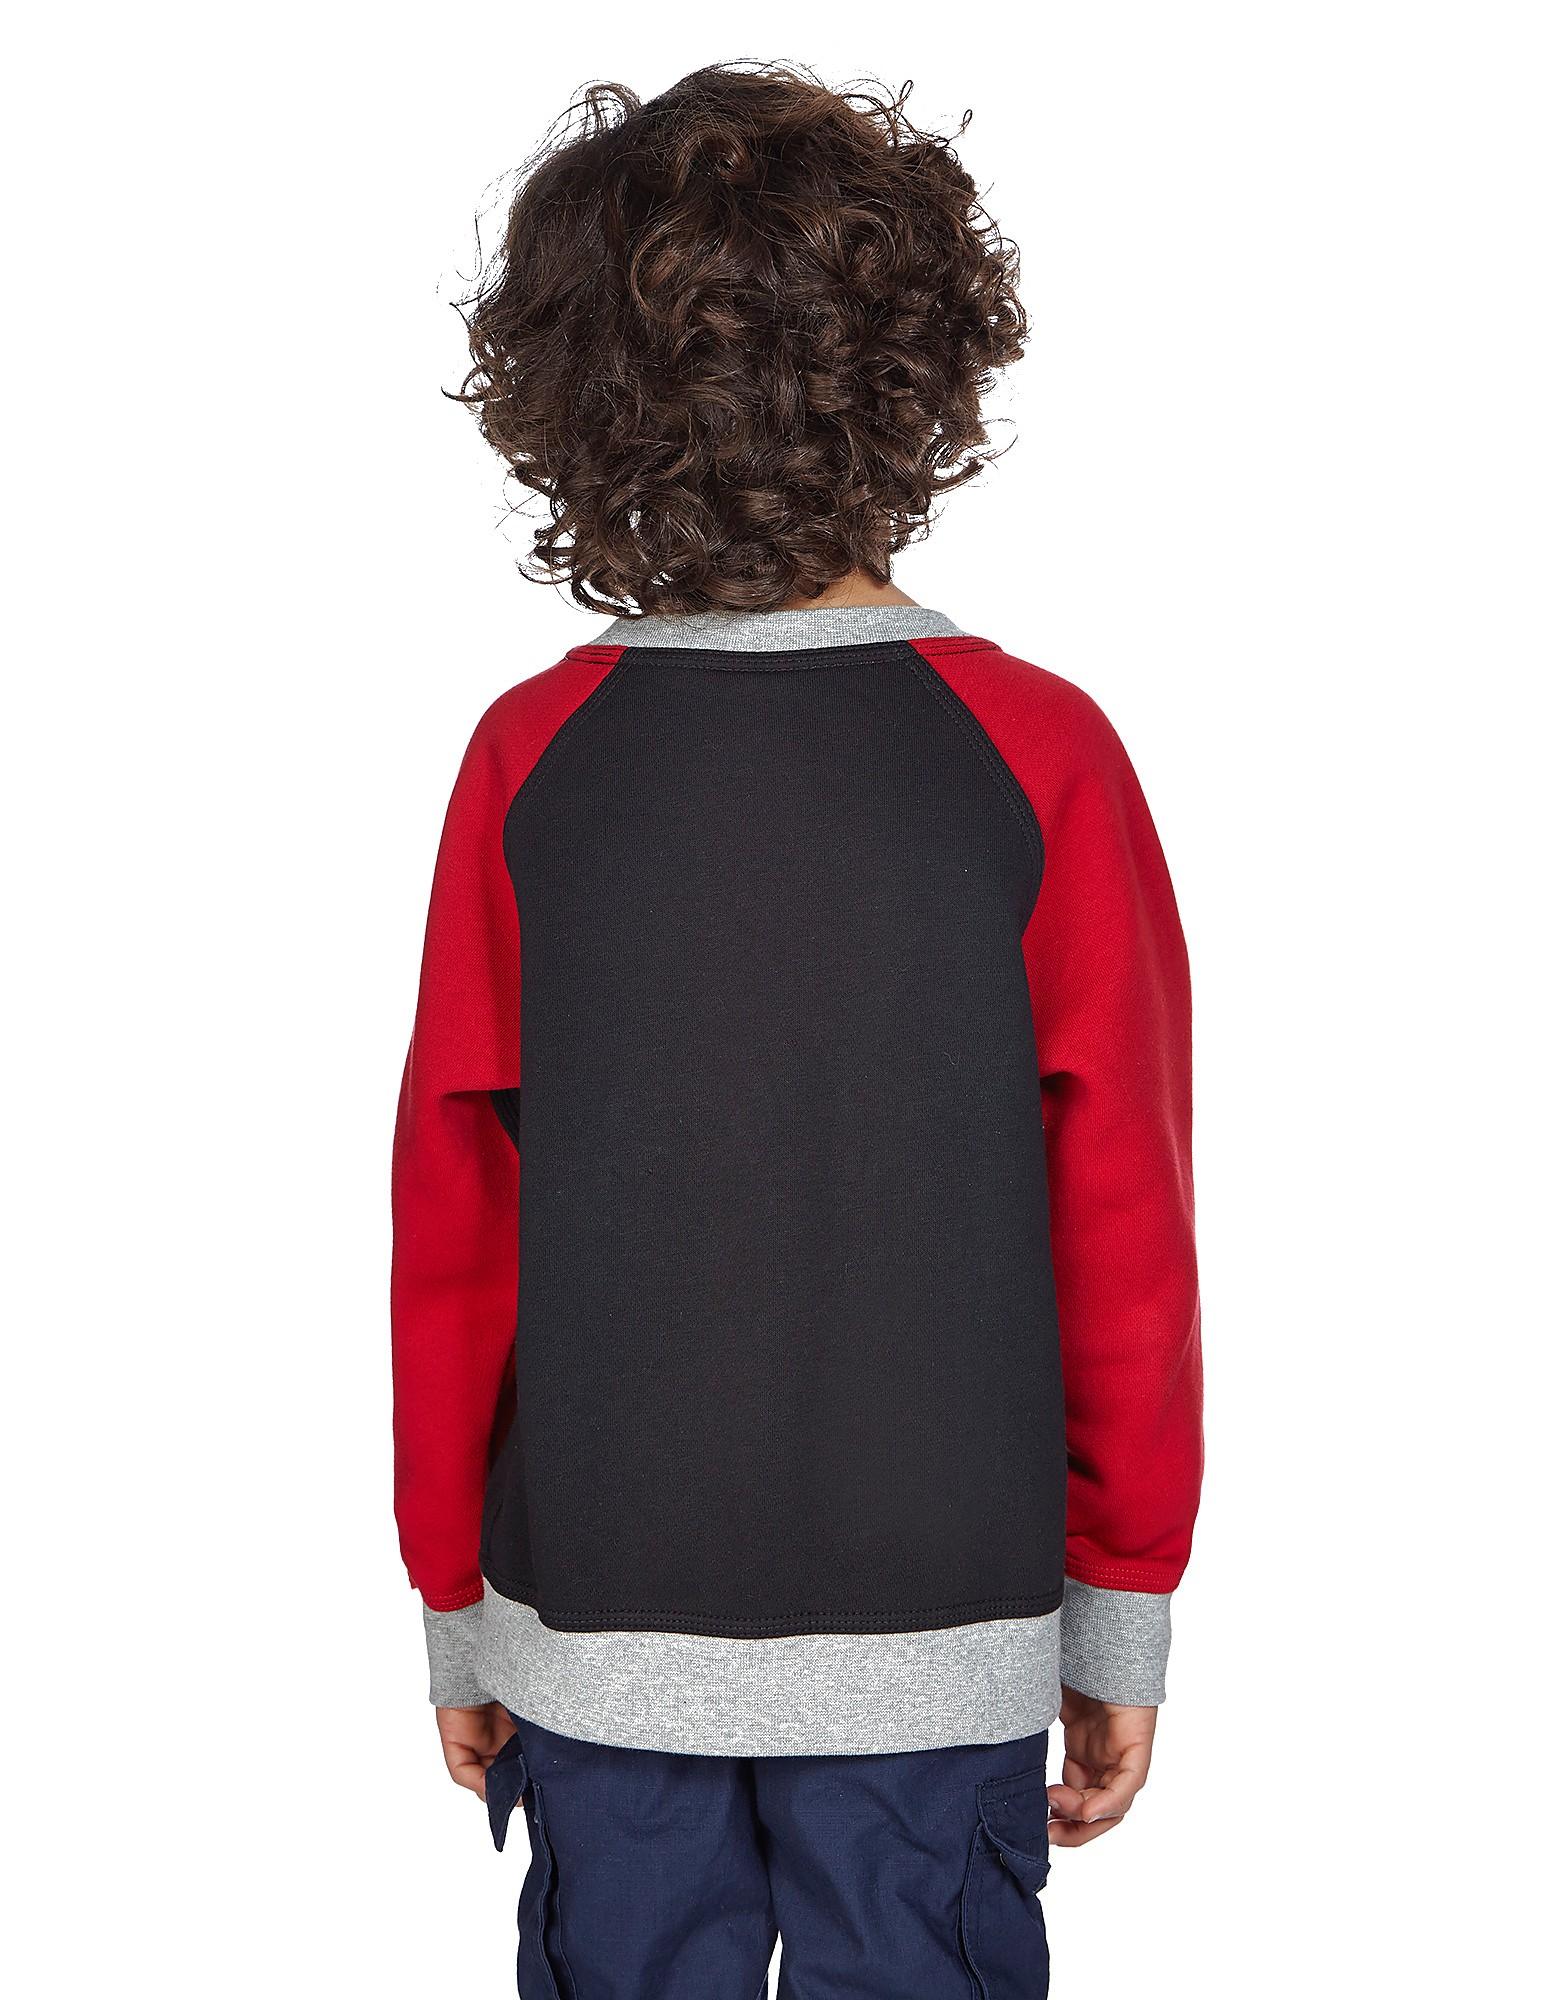 Nike Air Sweatshirt Children